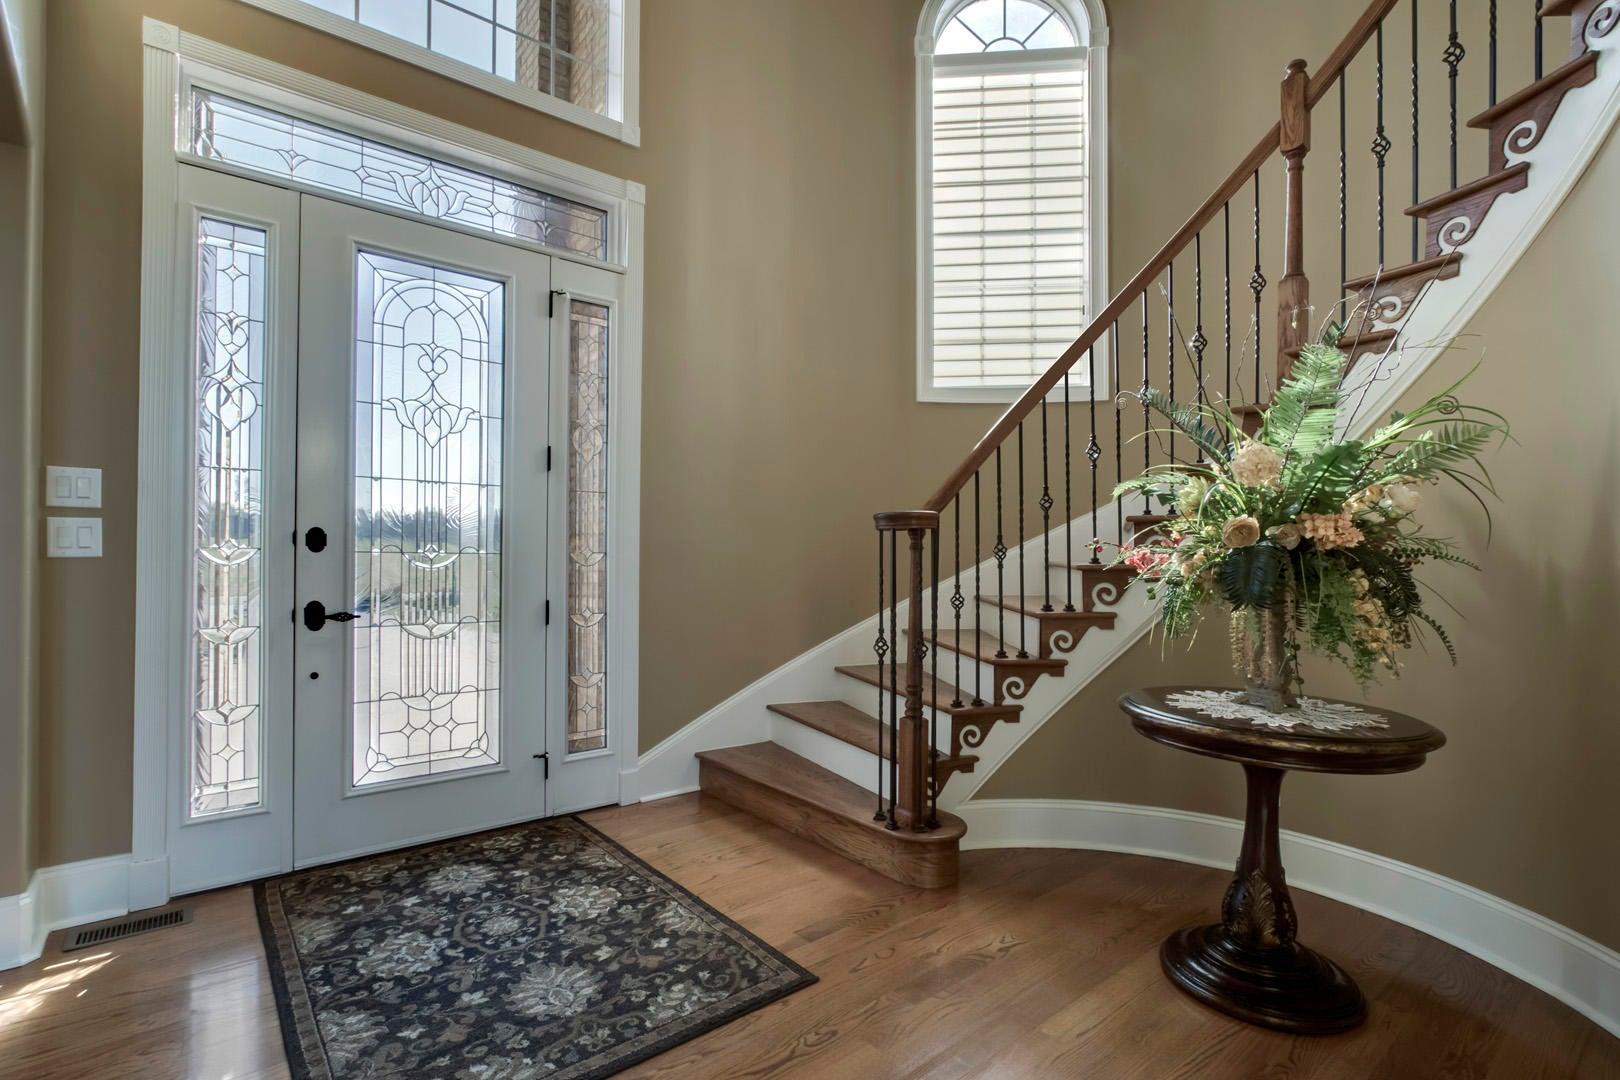 22_TopsailCourt_202_Entry-StairsUp